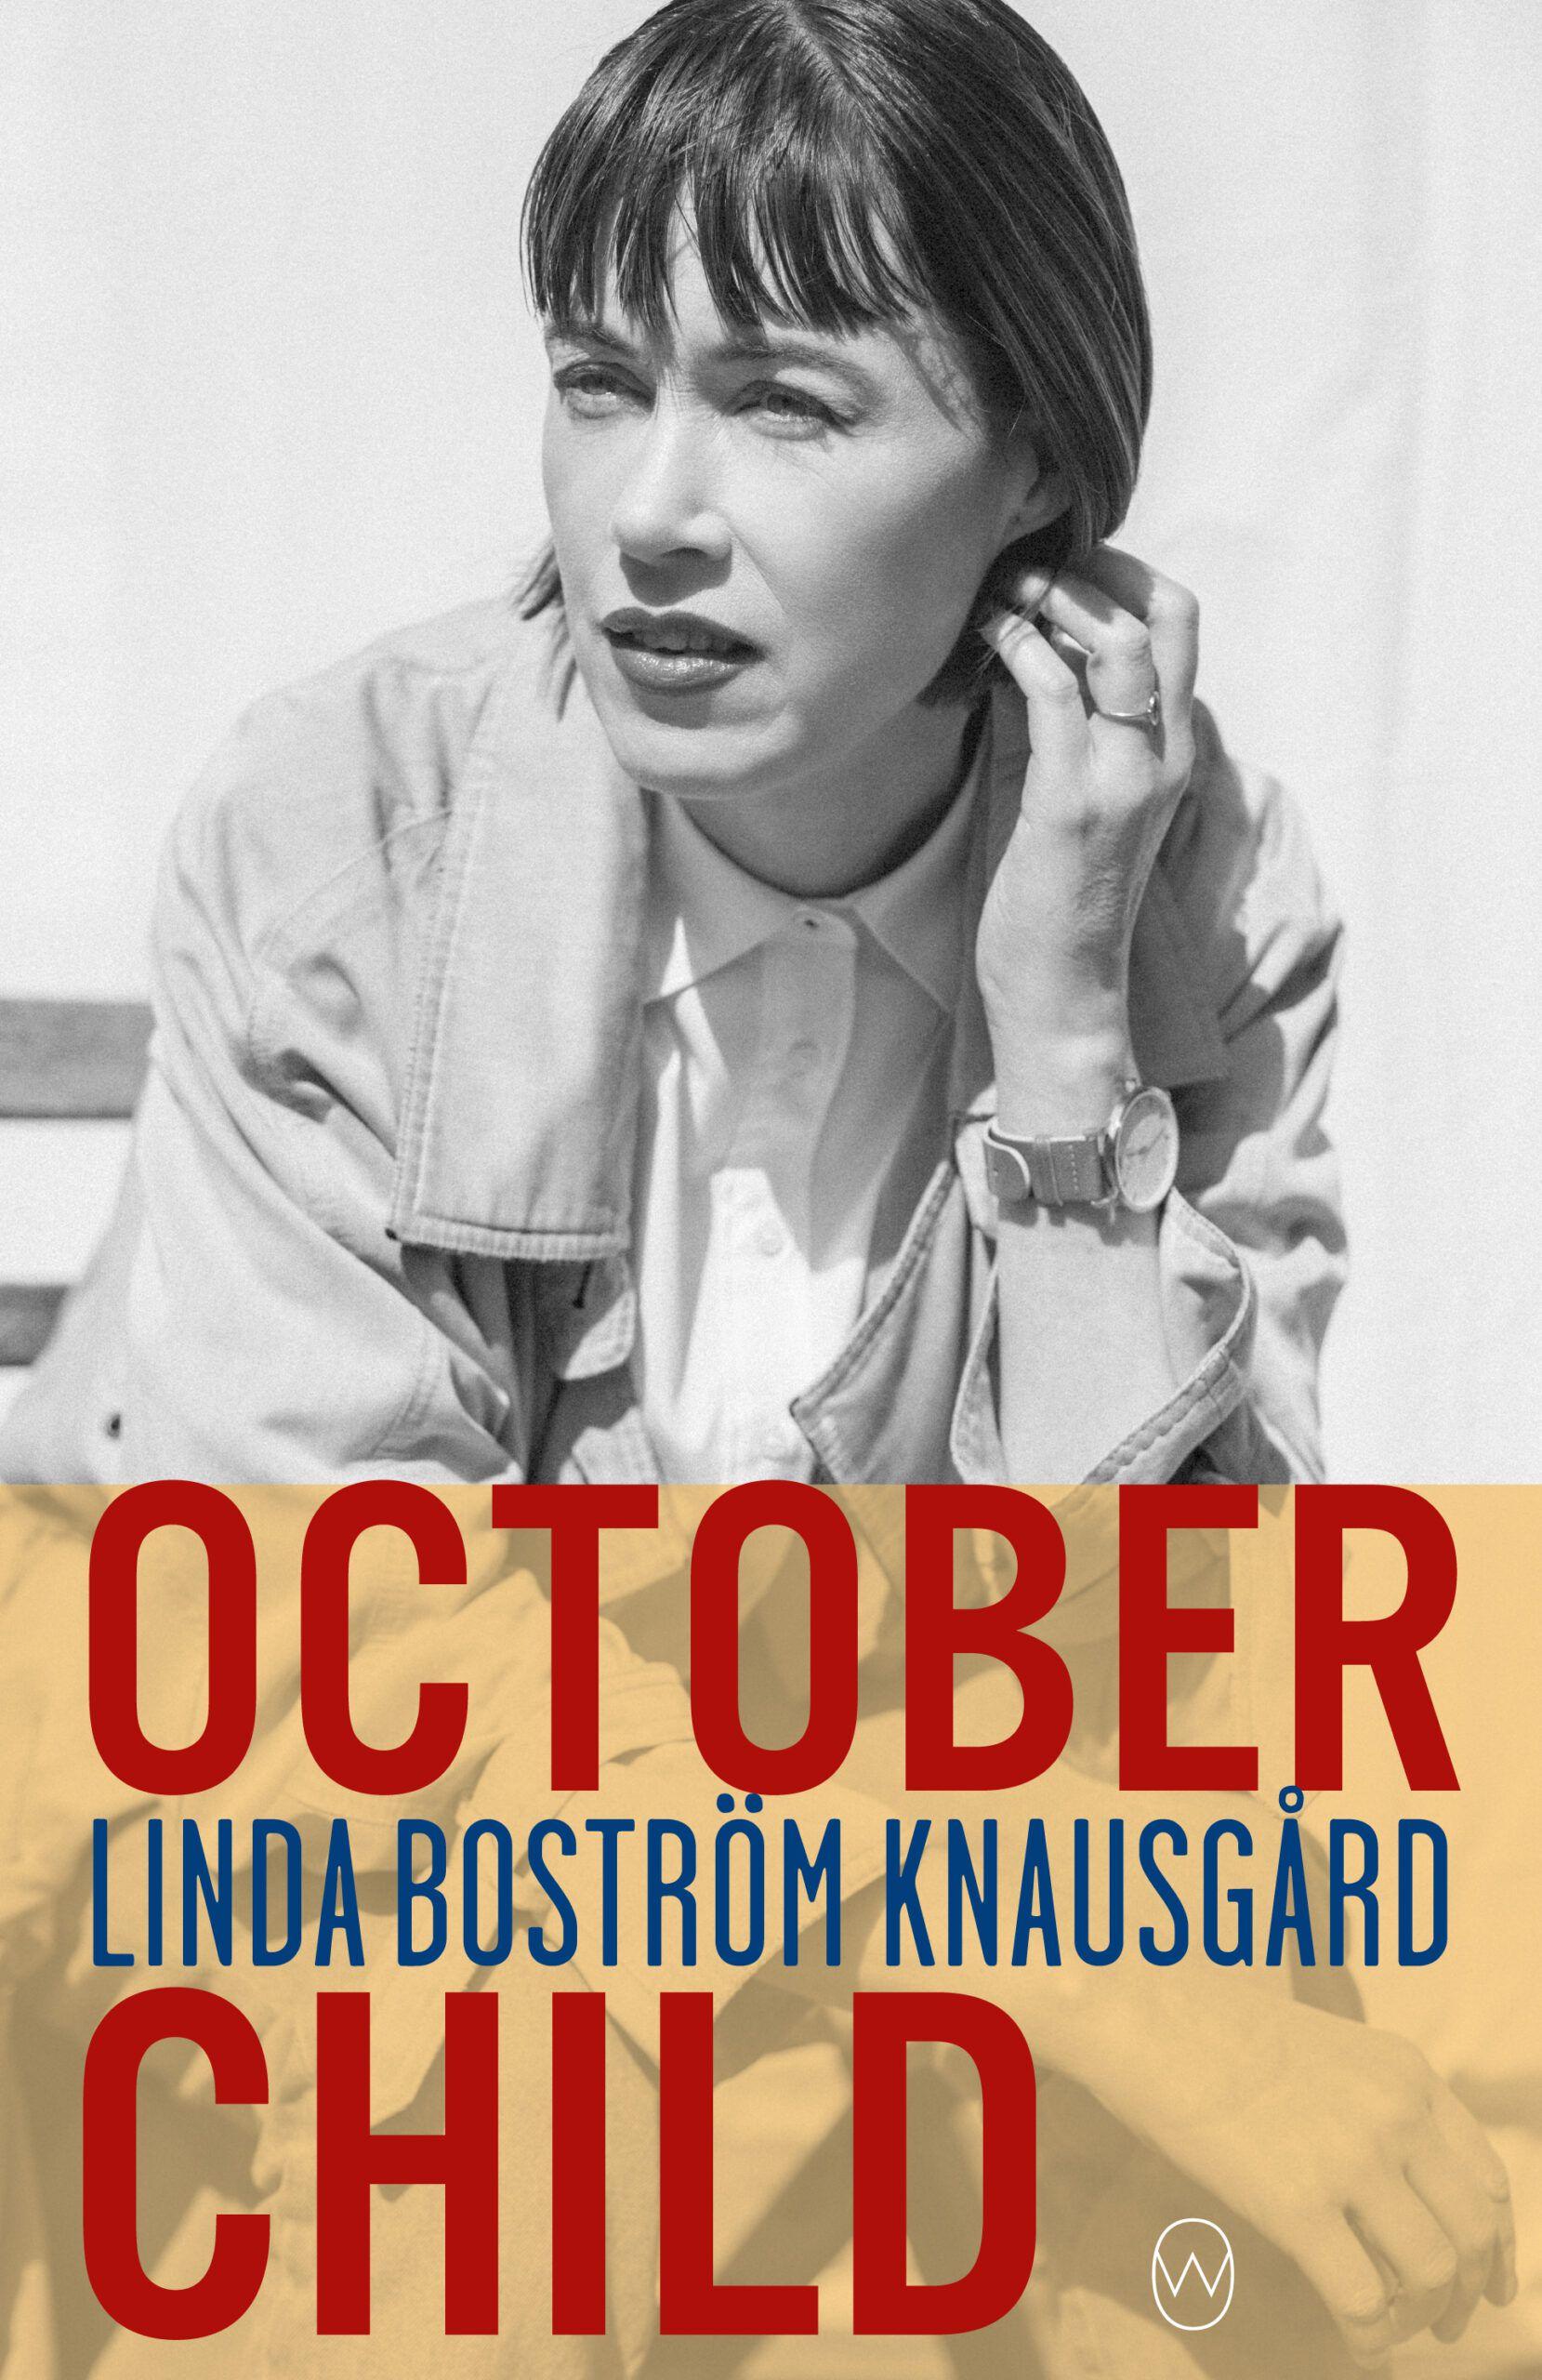 October Child by Linda Boström Knausgård, translated by Saskia Vogel